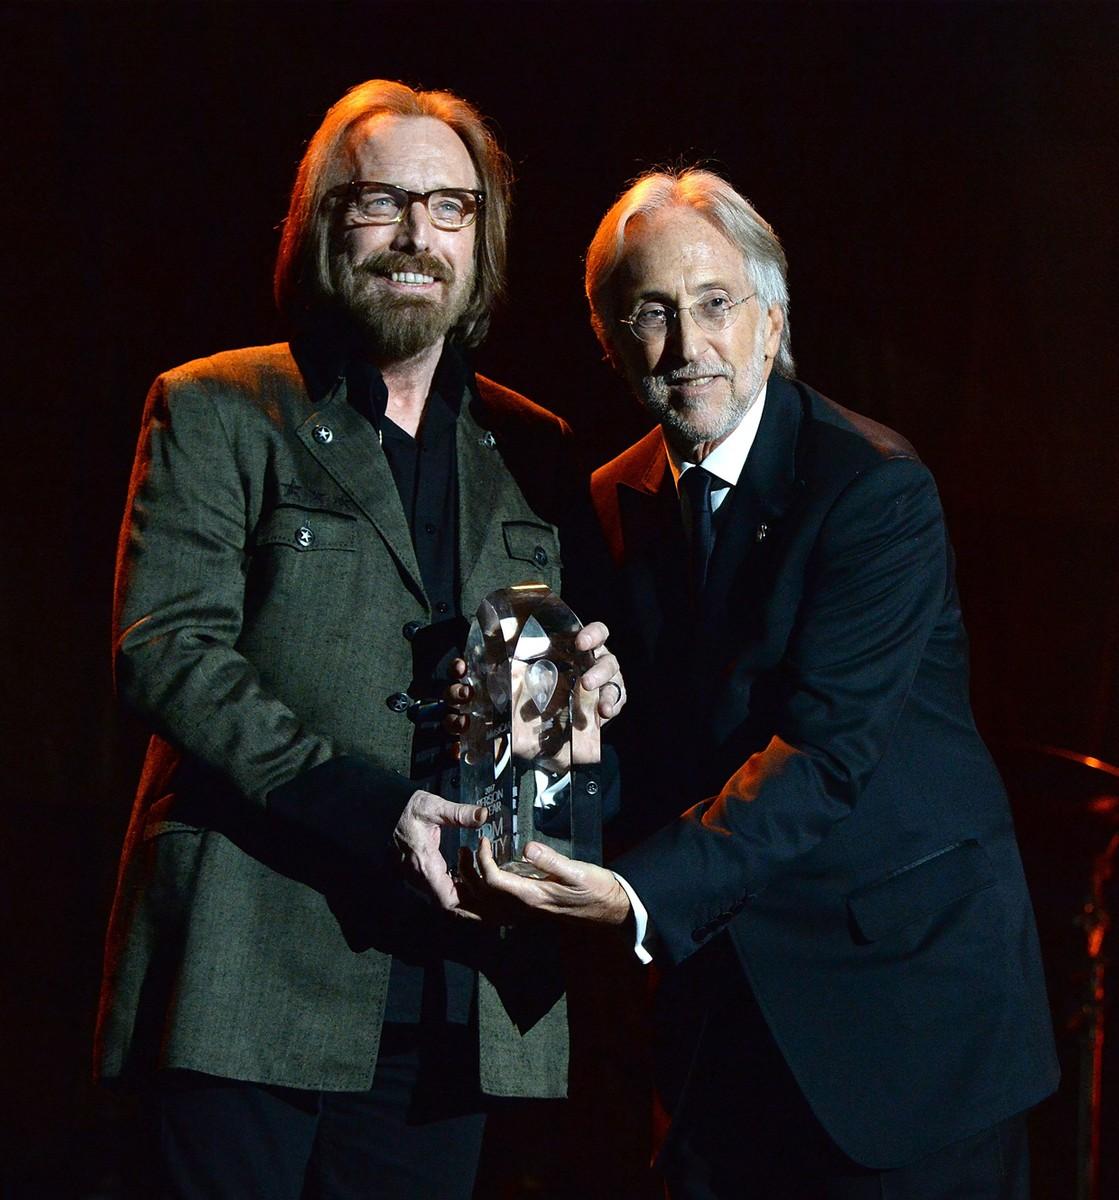 Tom Petty and Neil Portnow